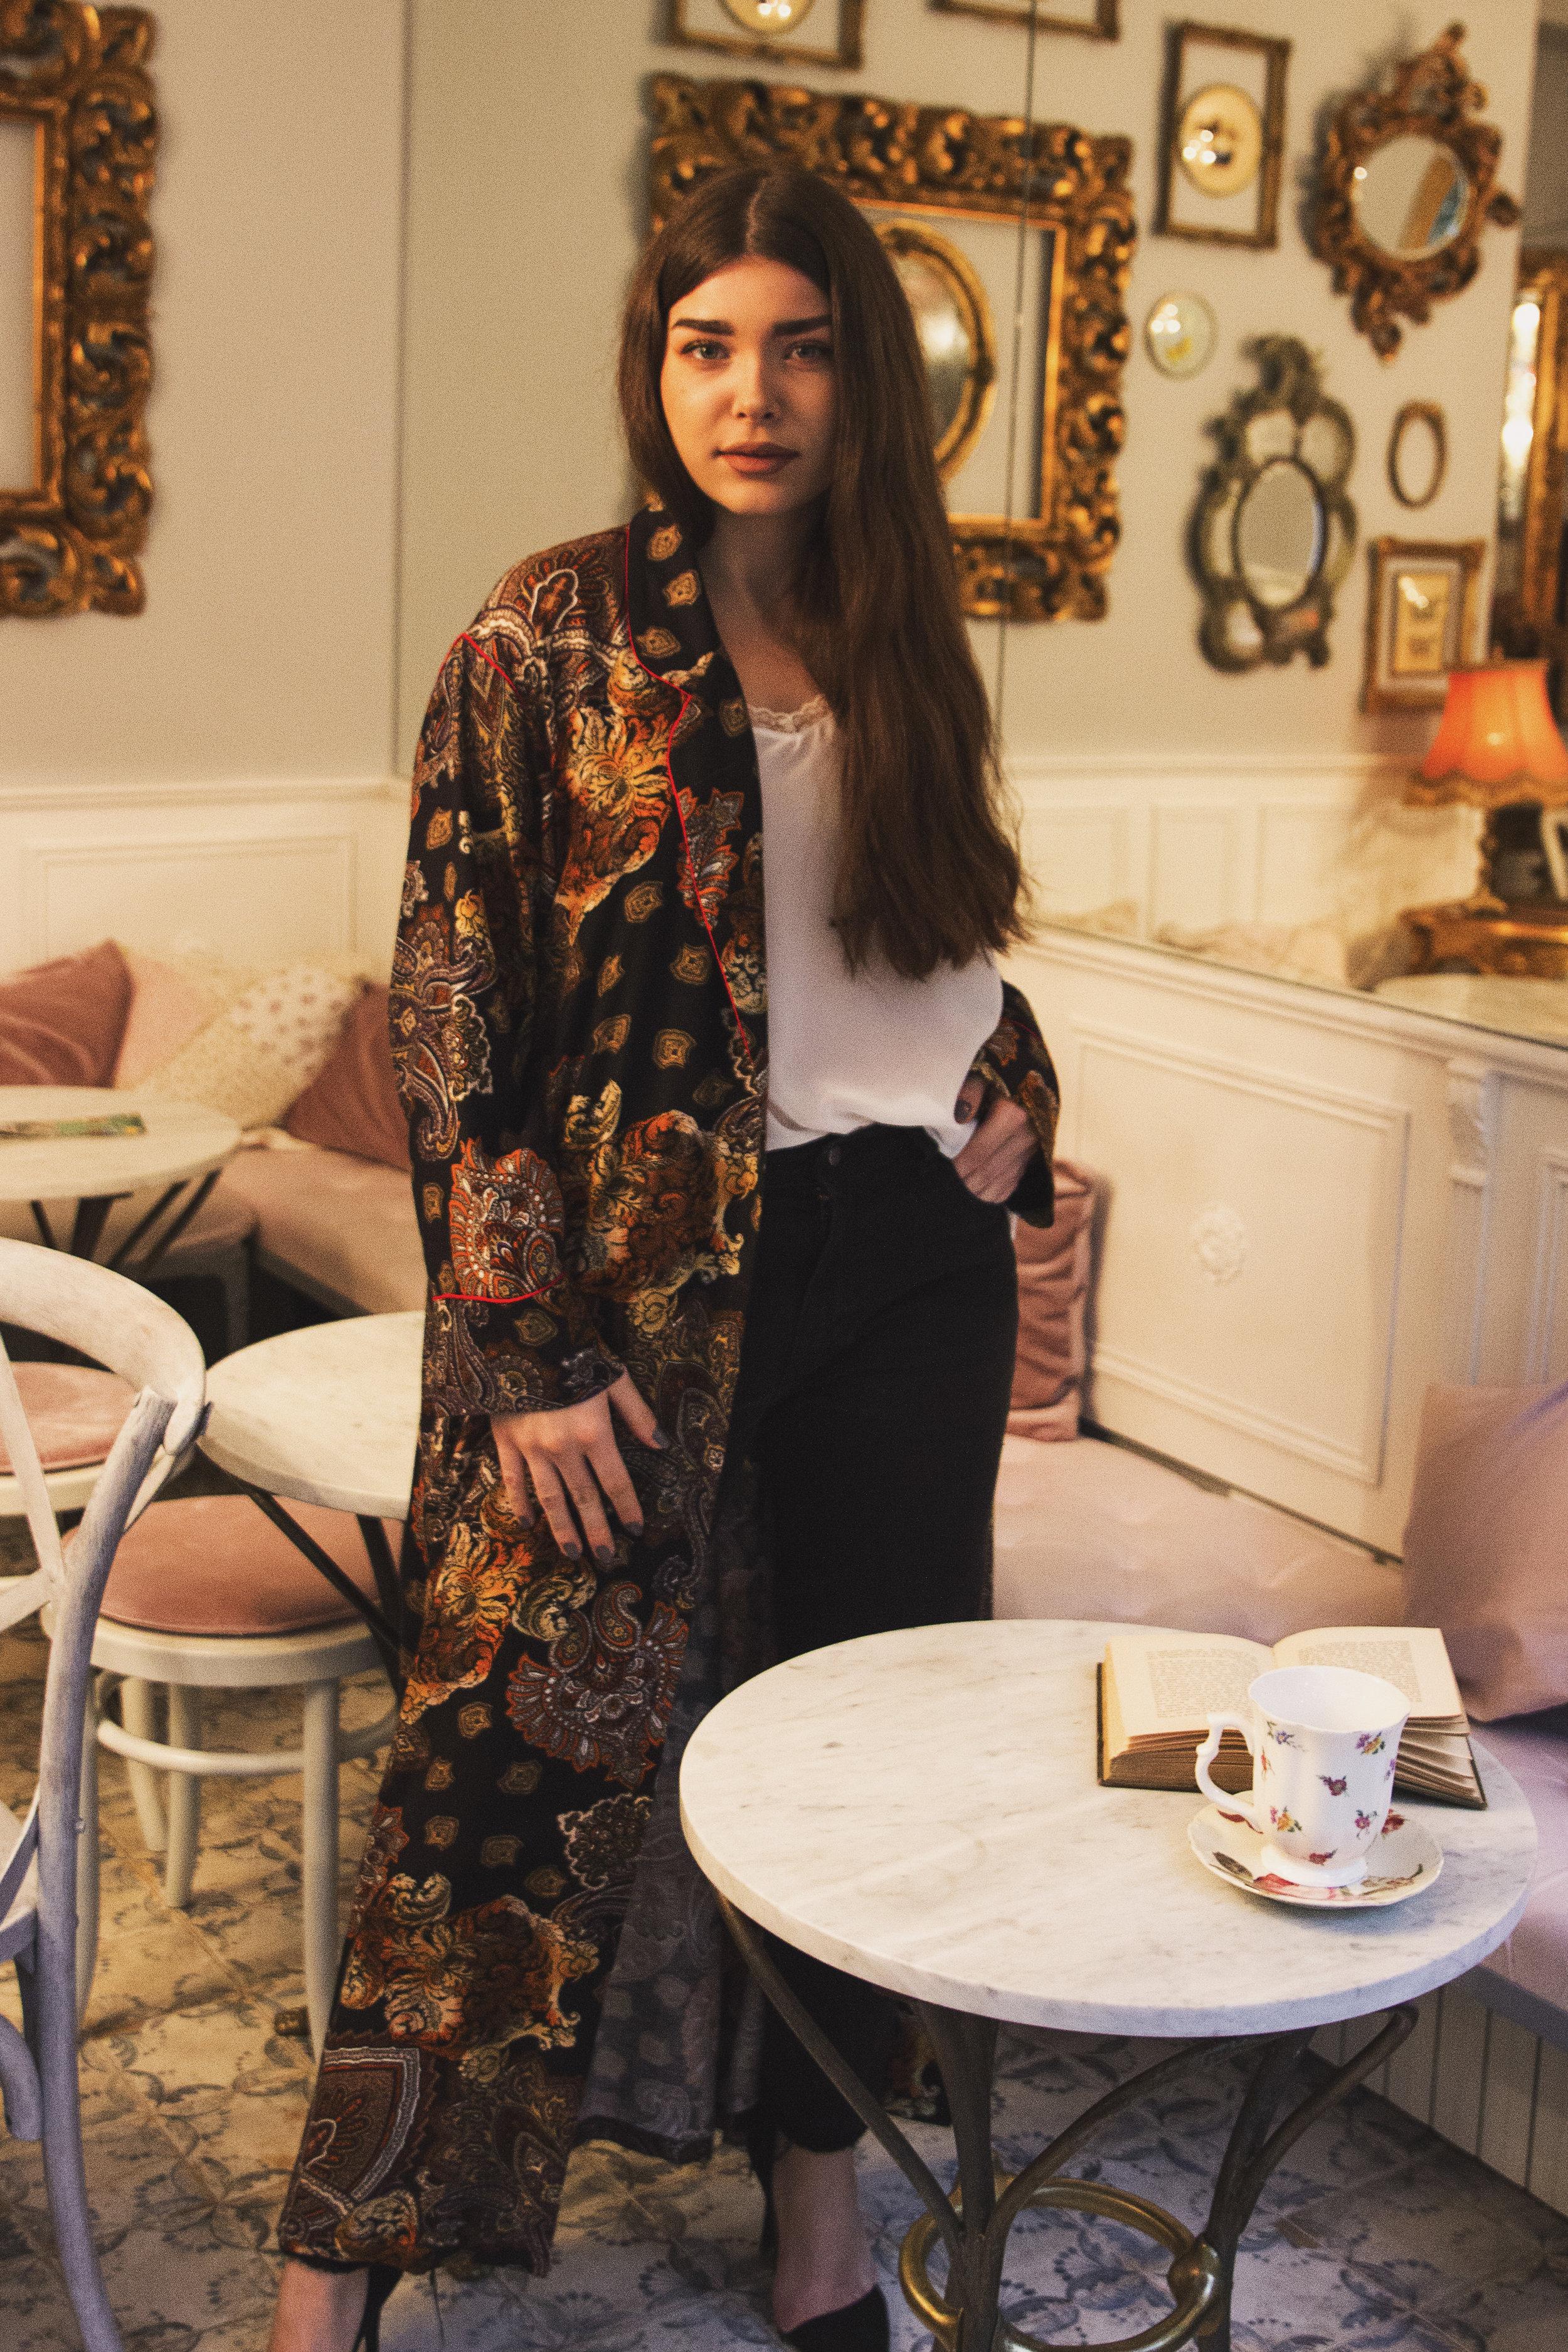 fashion-editorial-robert-sever-caffe-bar-finjak-expensive-reality-fashion-photography (5).jpg